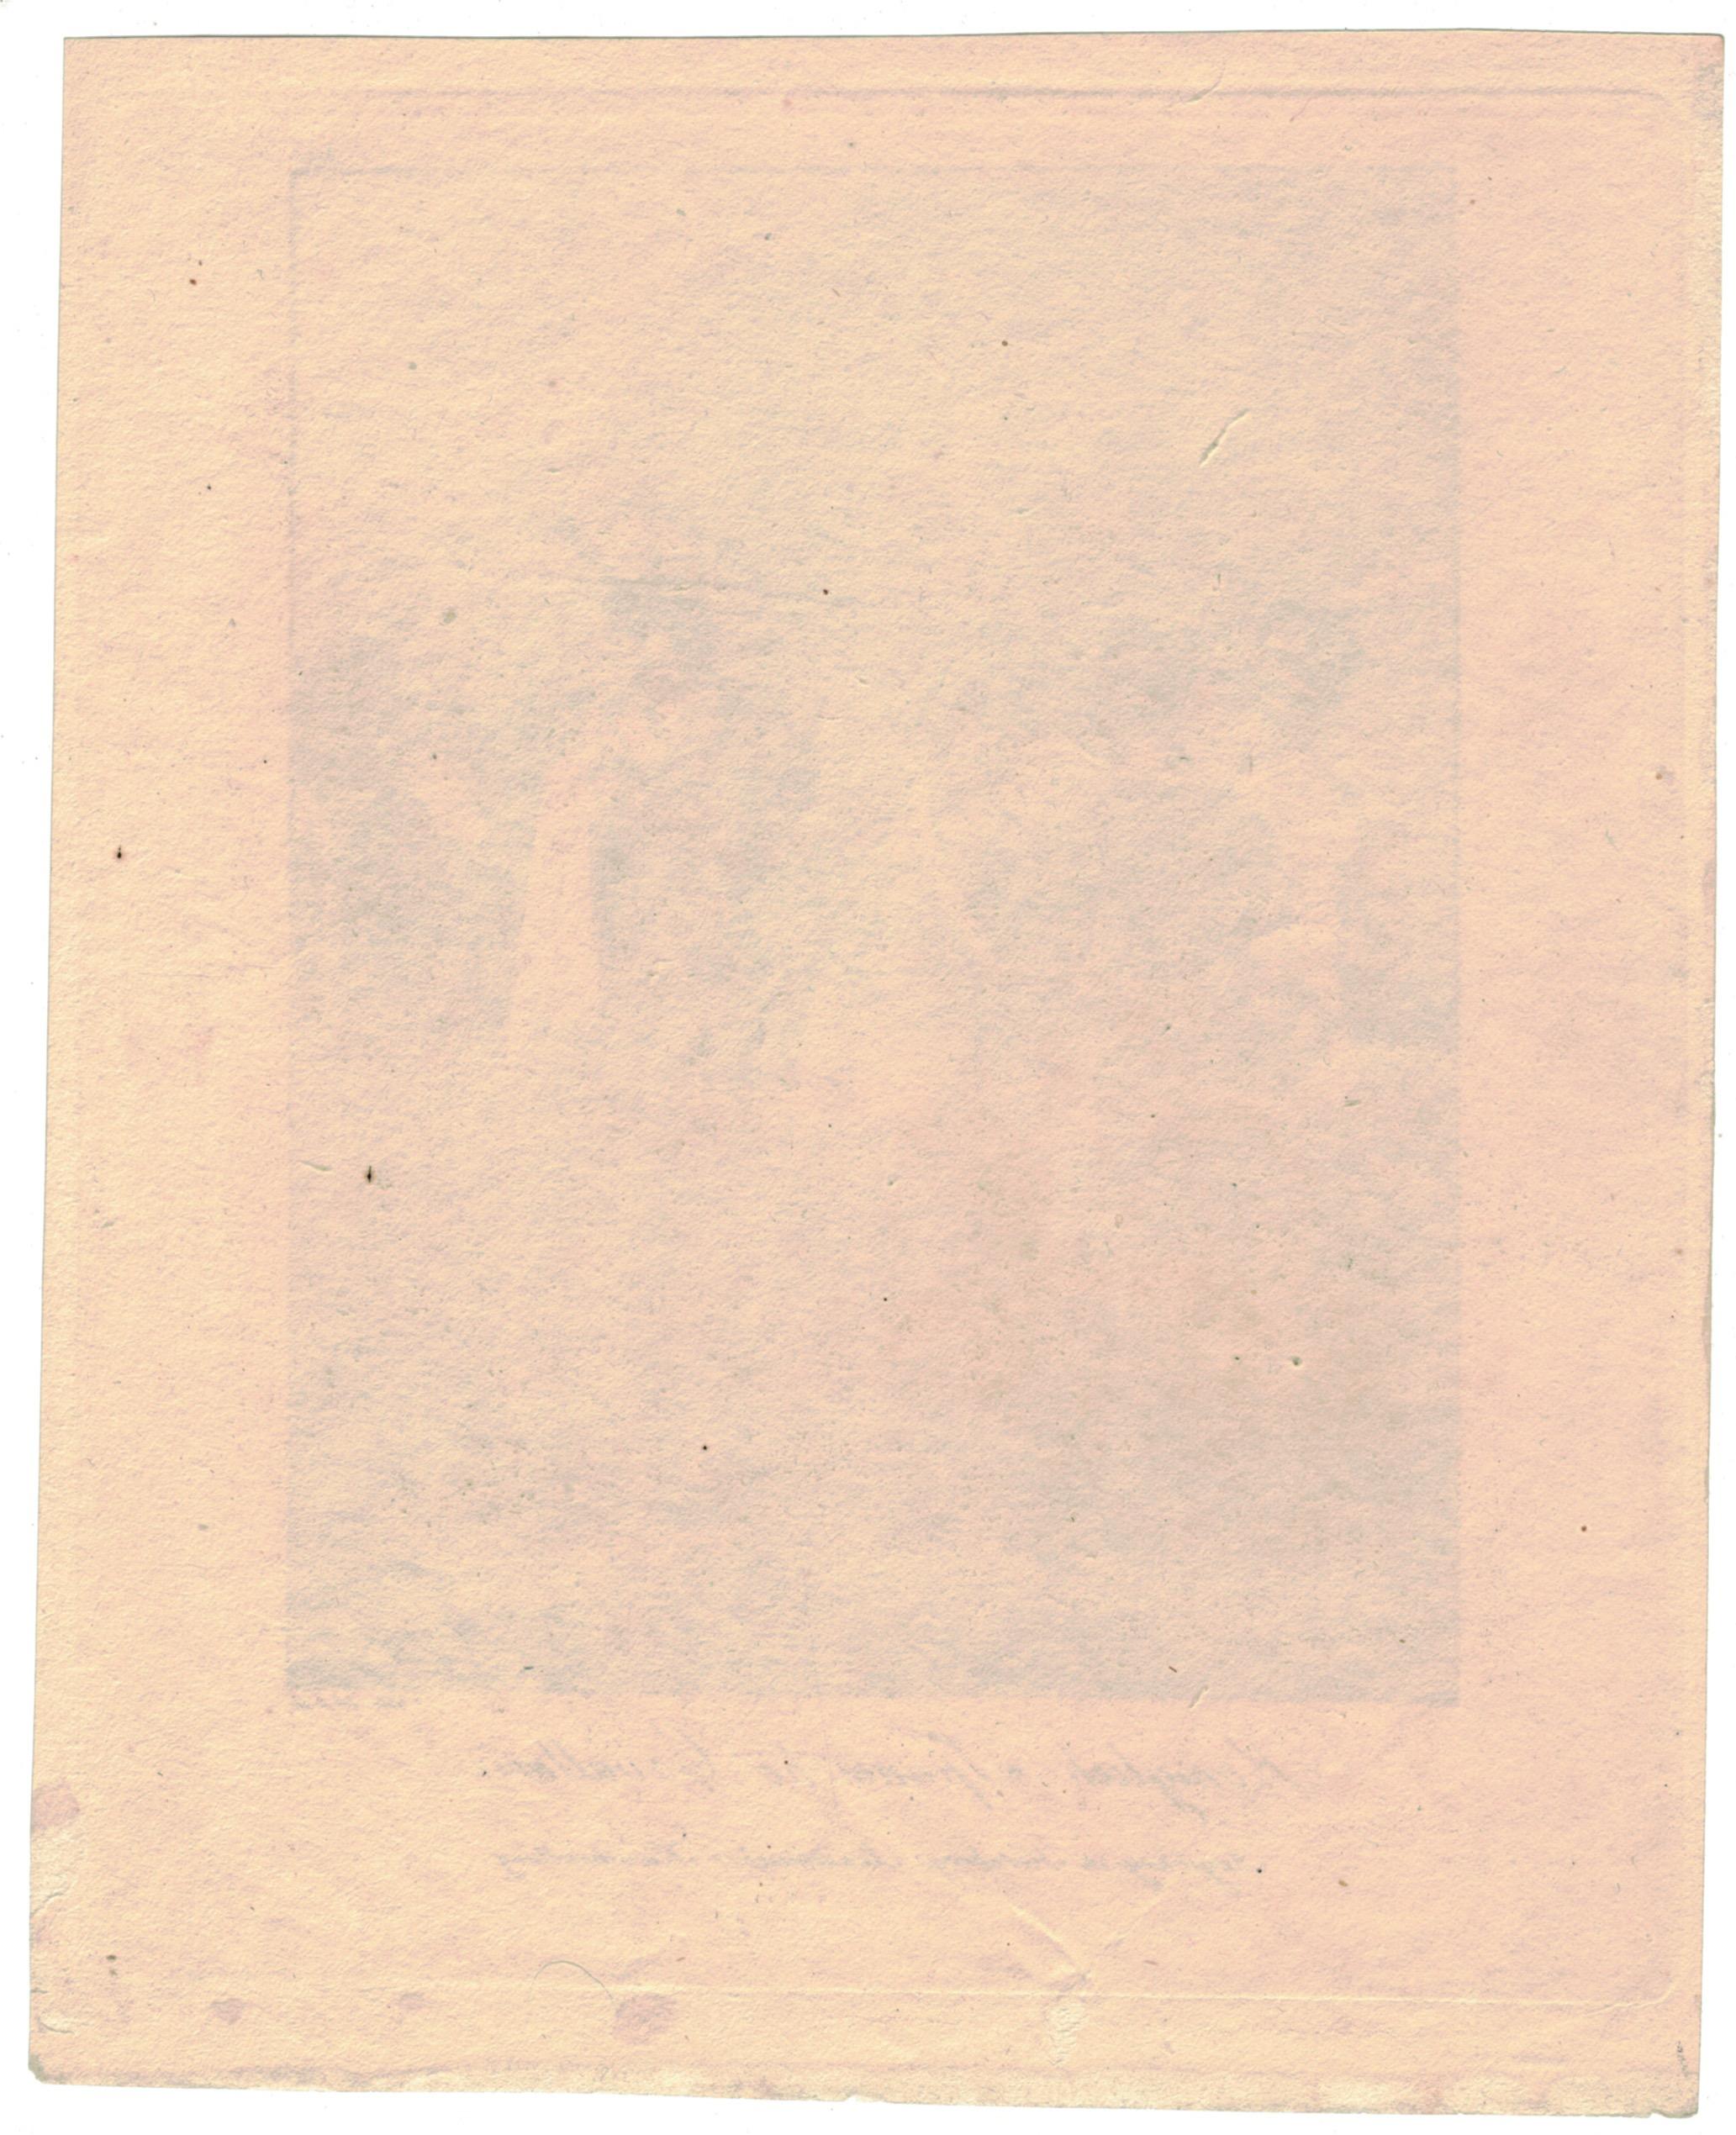 Gravure XIX - SEELE, VOLZ und EBNER - Troupes Espagnoles - Cavalerie - Uniforme - 1er Empire - Cira 1810